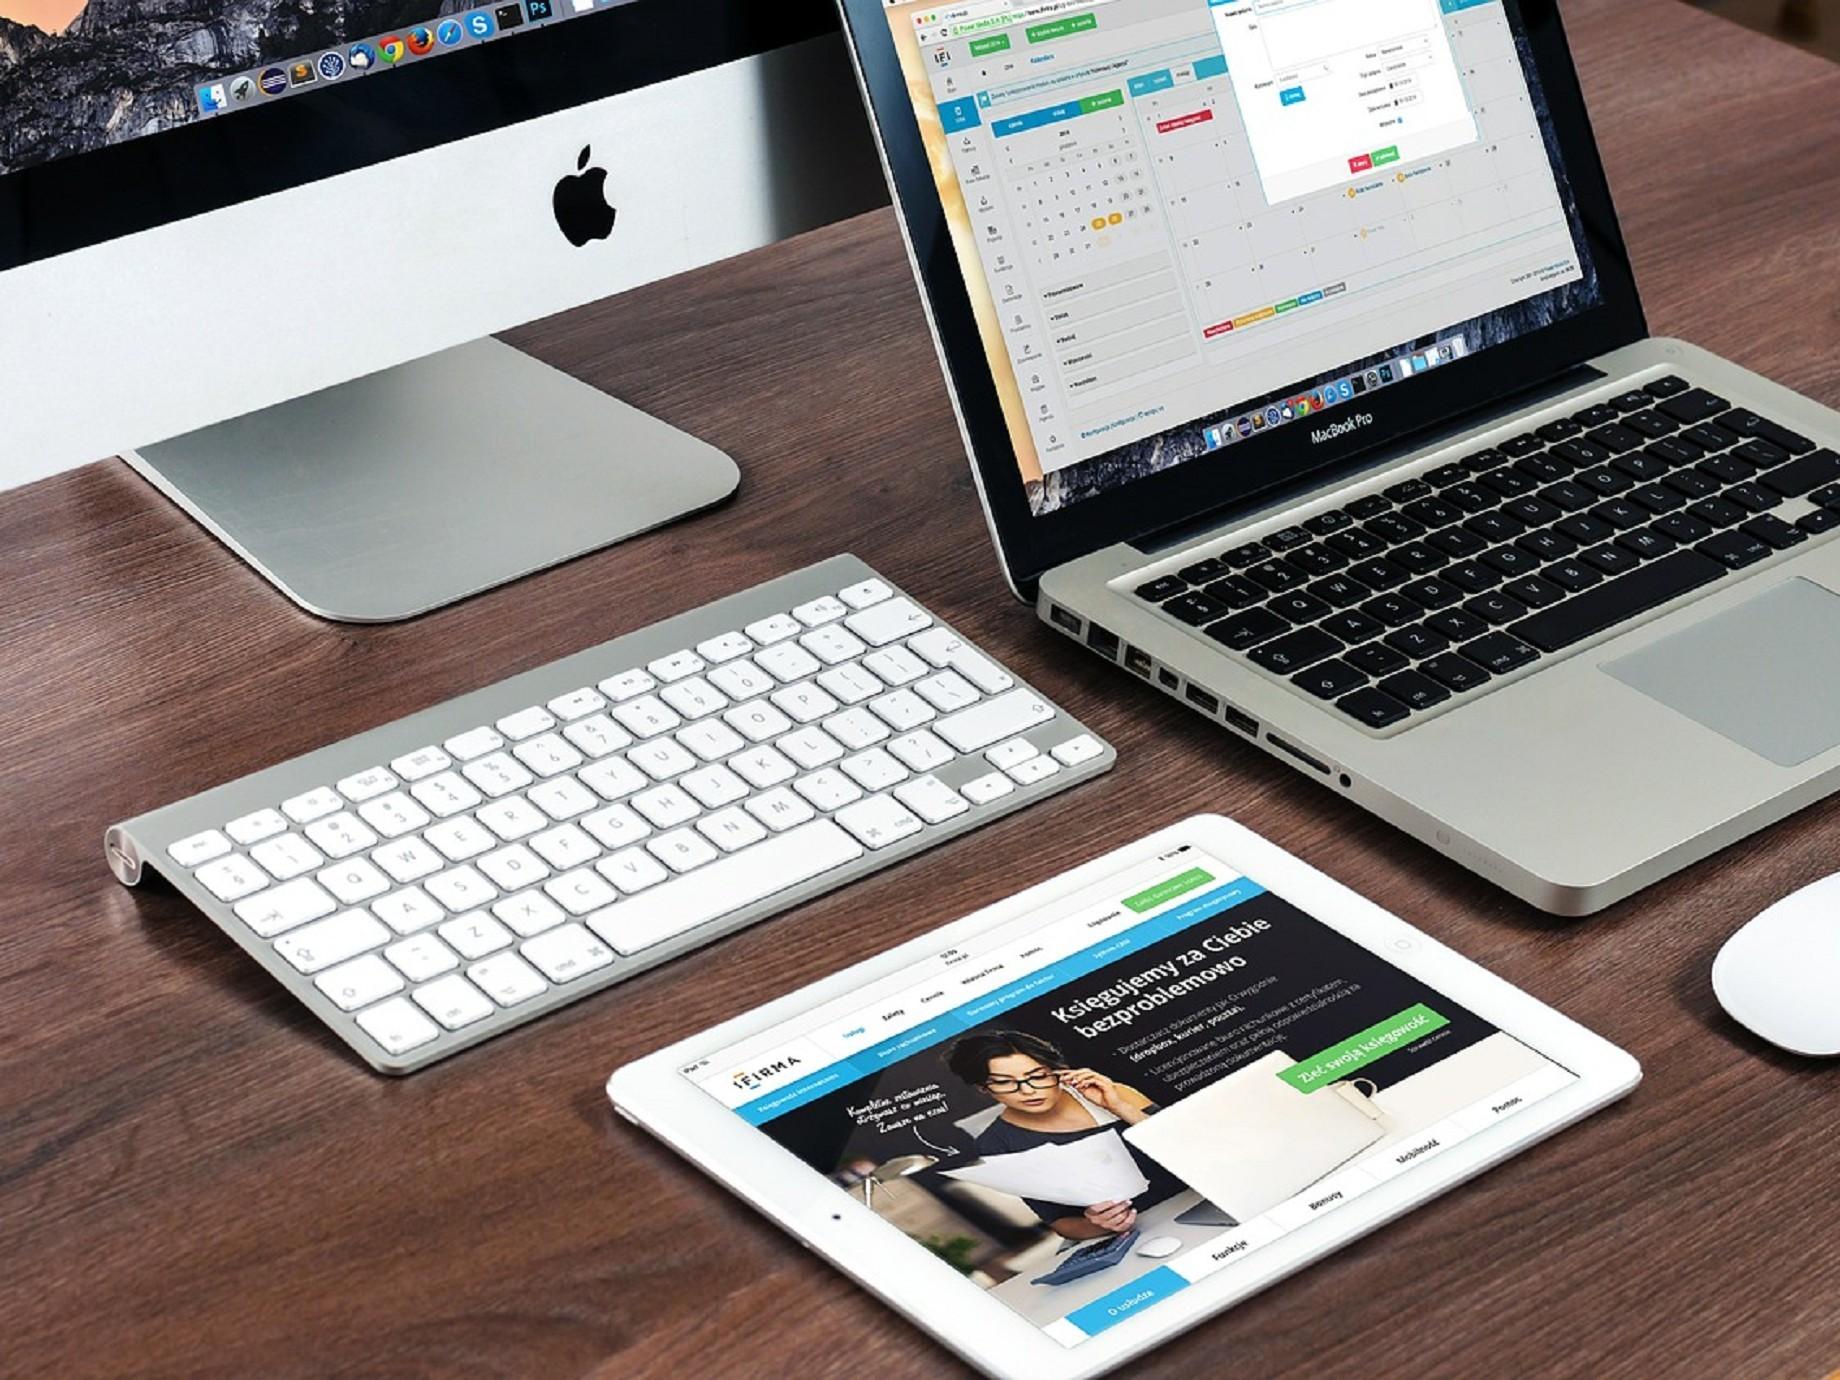 SmartM每週專題》跨裝置行銷時代來臨, 行銷人,你的跨裝置行銷計畫在哪裡?